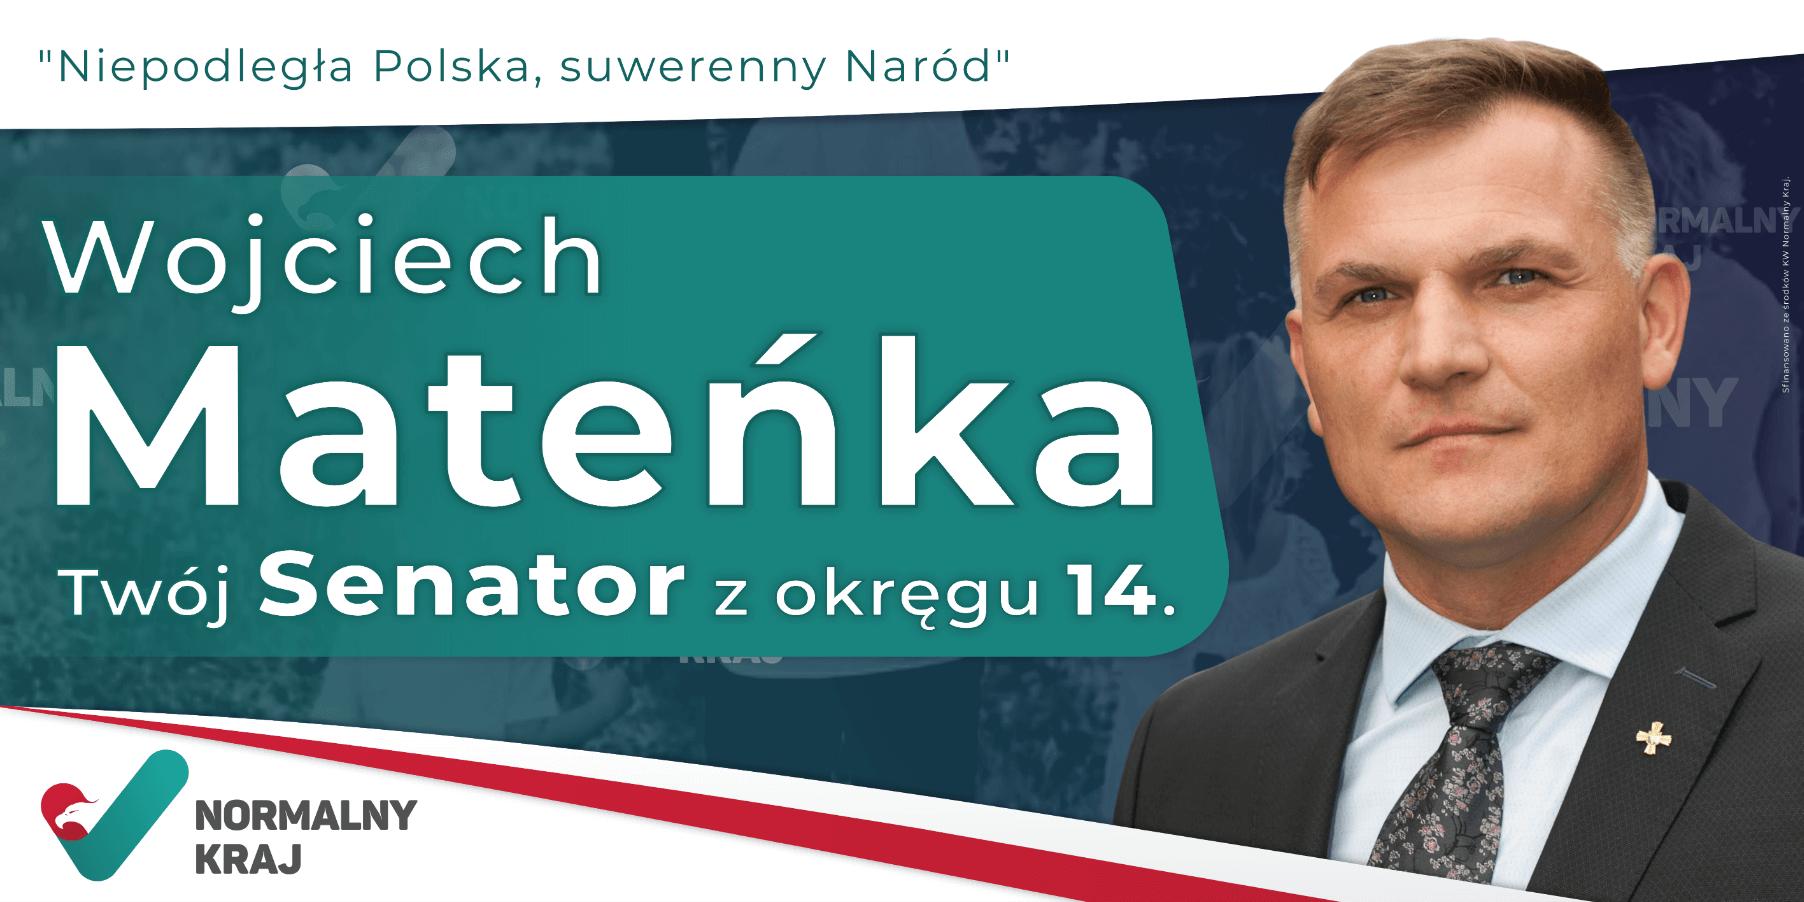 Wojciech Mateńka